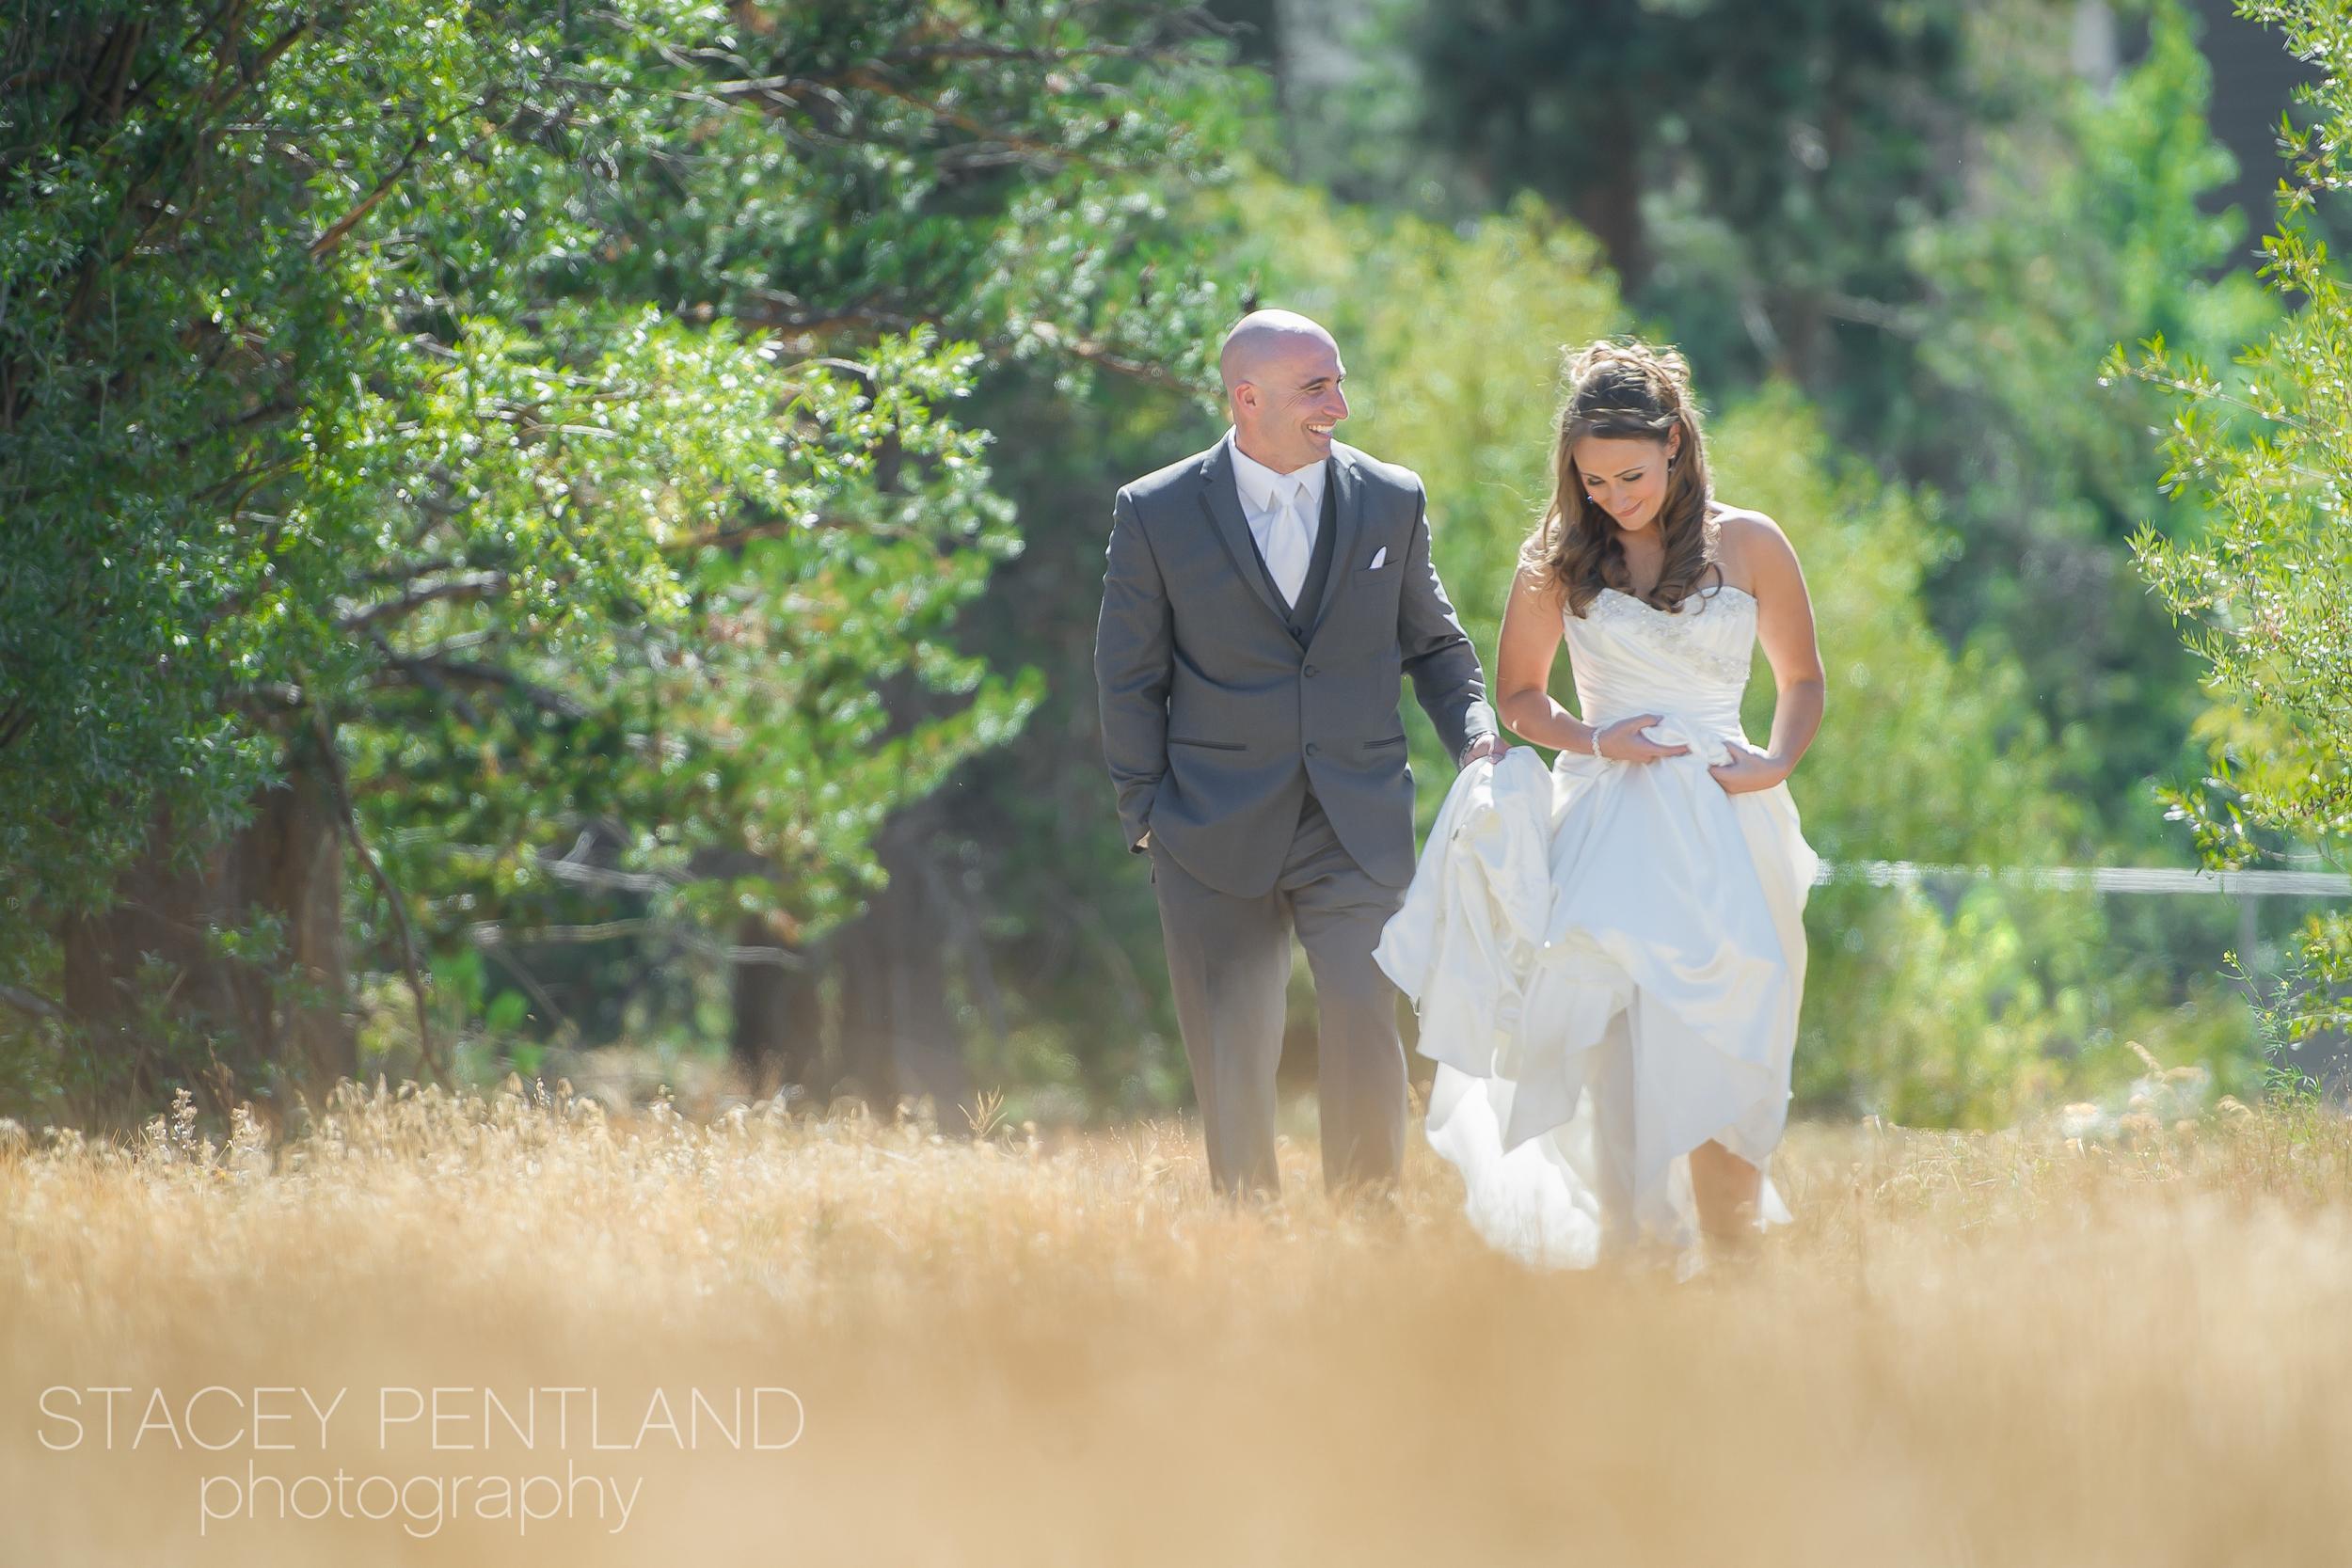 audrey+shane_wedding_spp_001.jpg